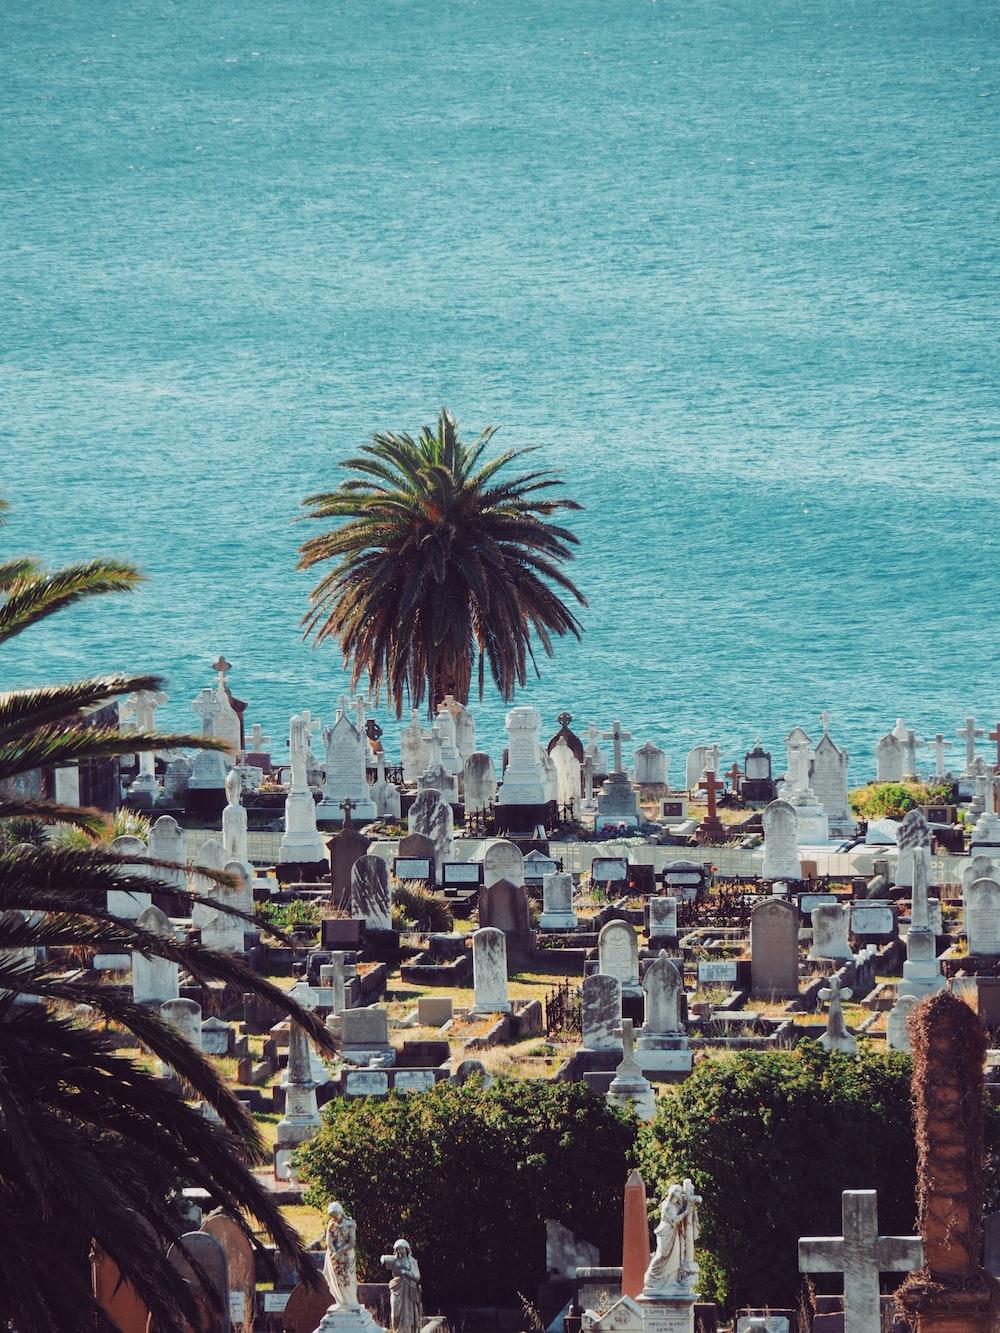 birds eye view of graveyard near body of water